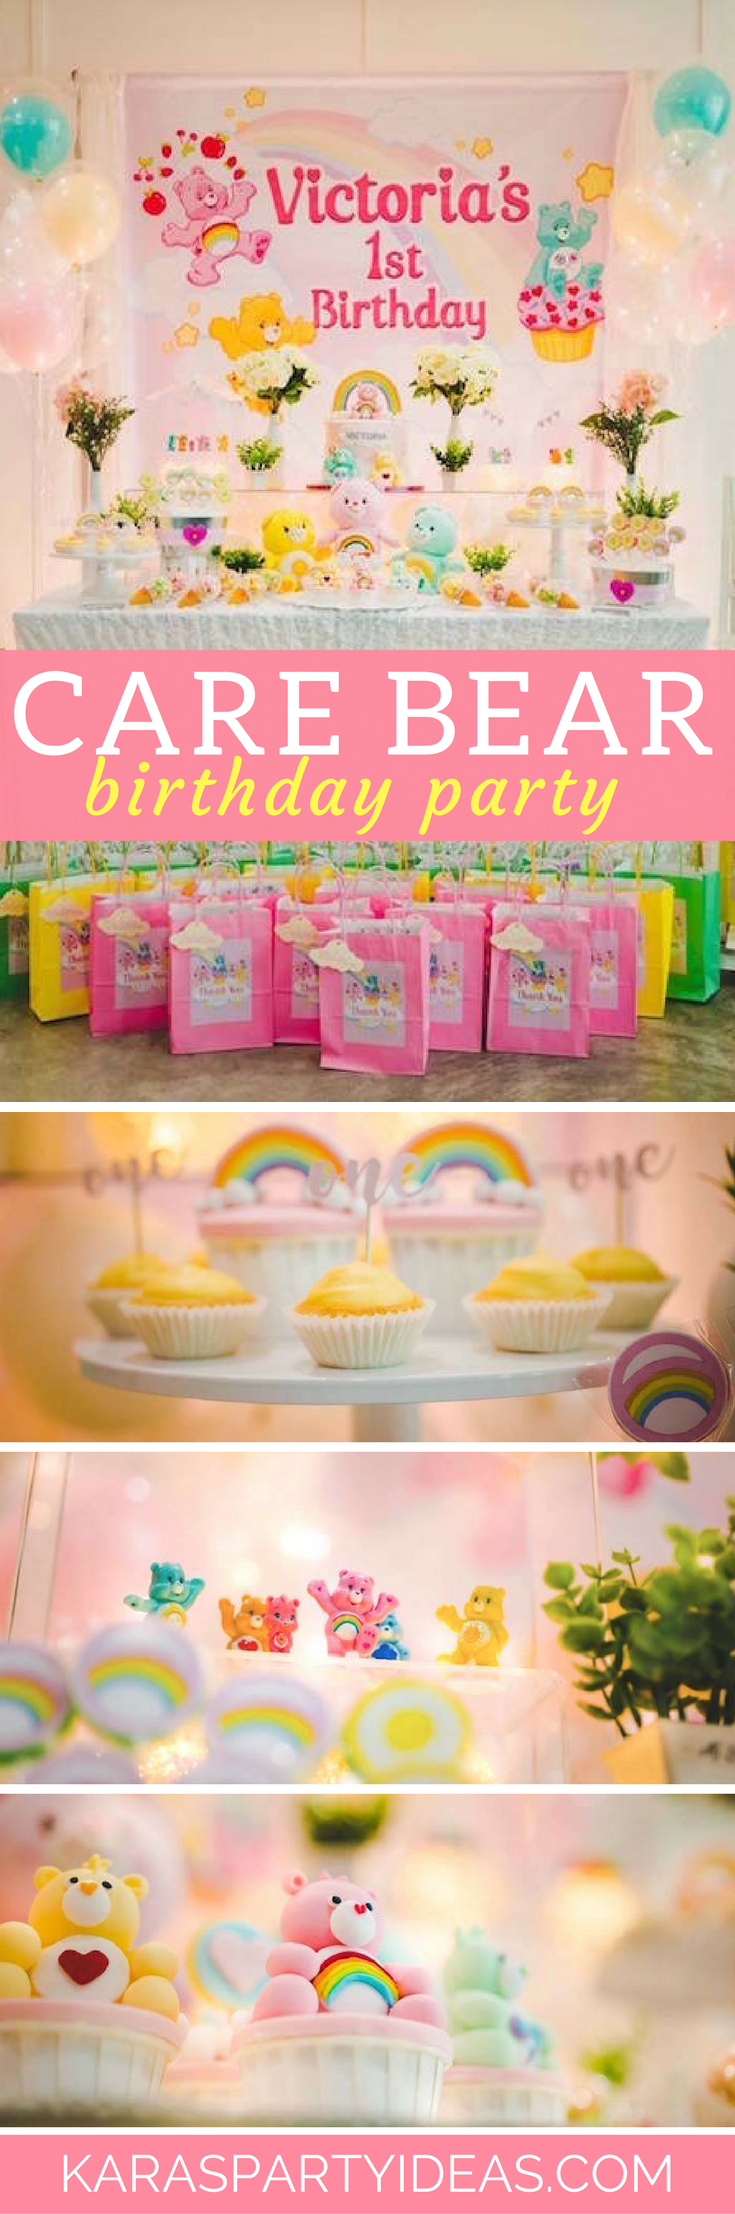 Care Bear Birthday Party via Kara's Party Ideas - KarasPartyIdeas.com